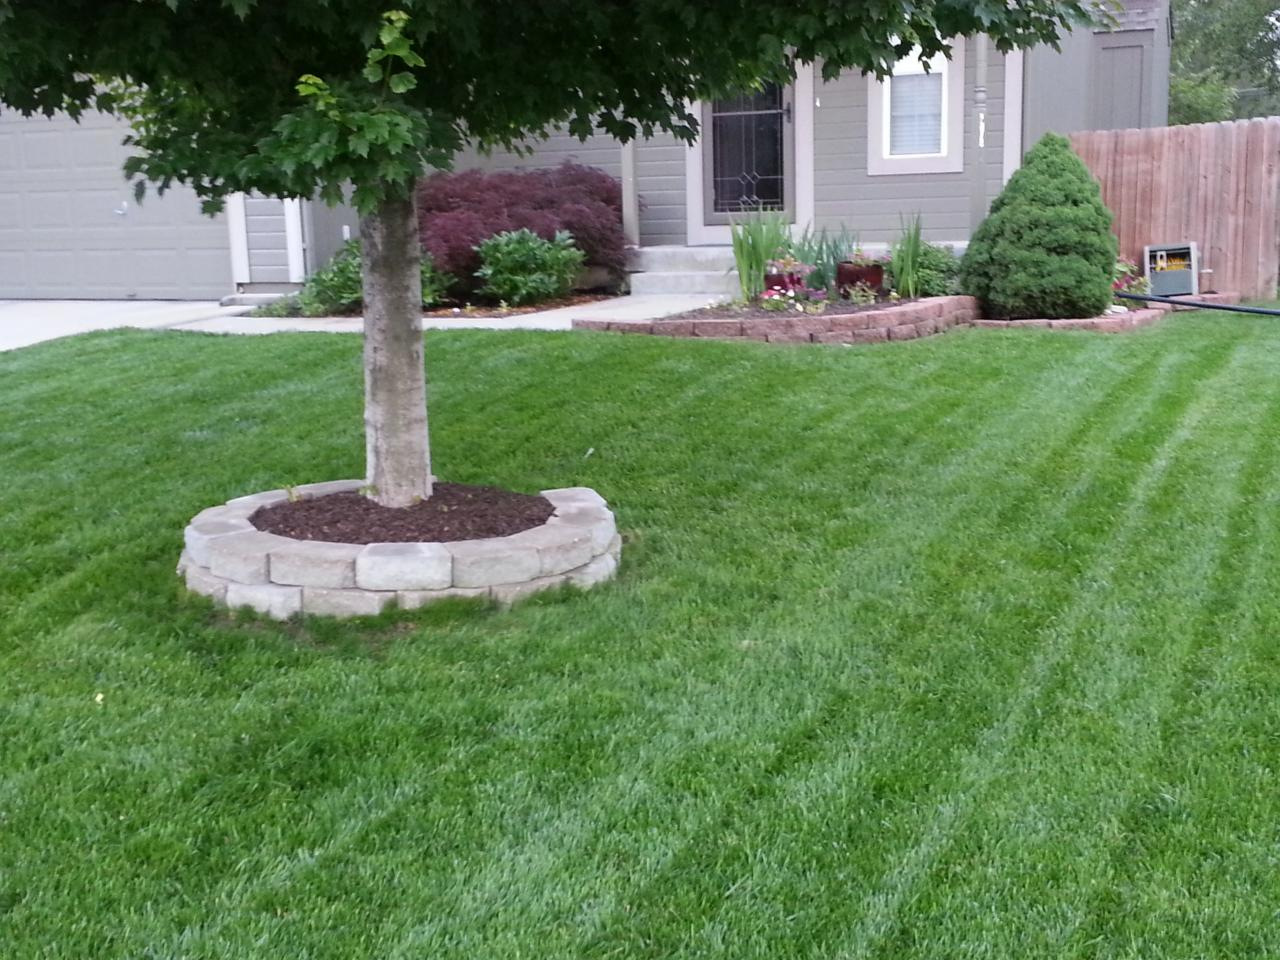 Lawn Care Service in Liberty, MO, 64068